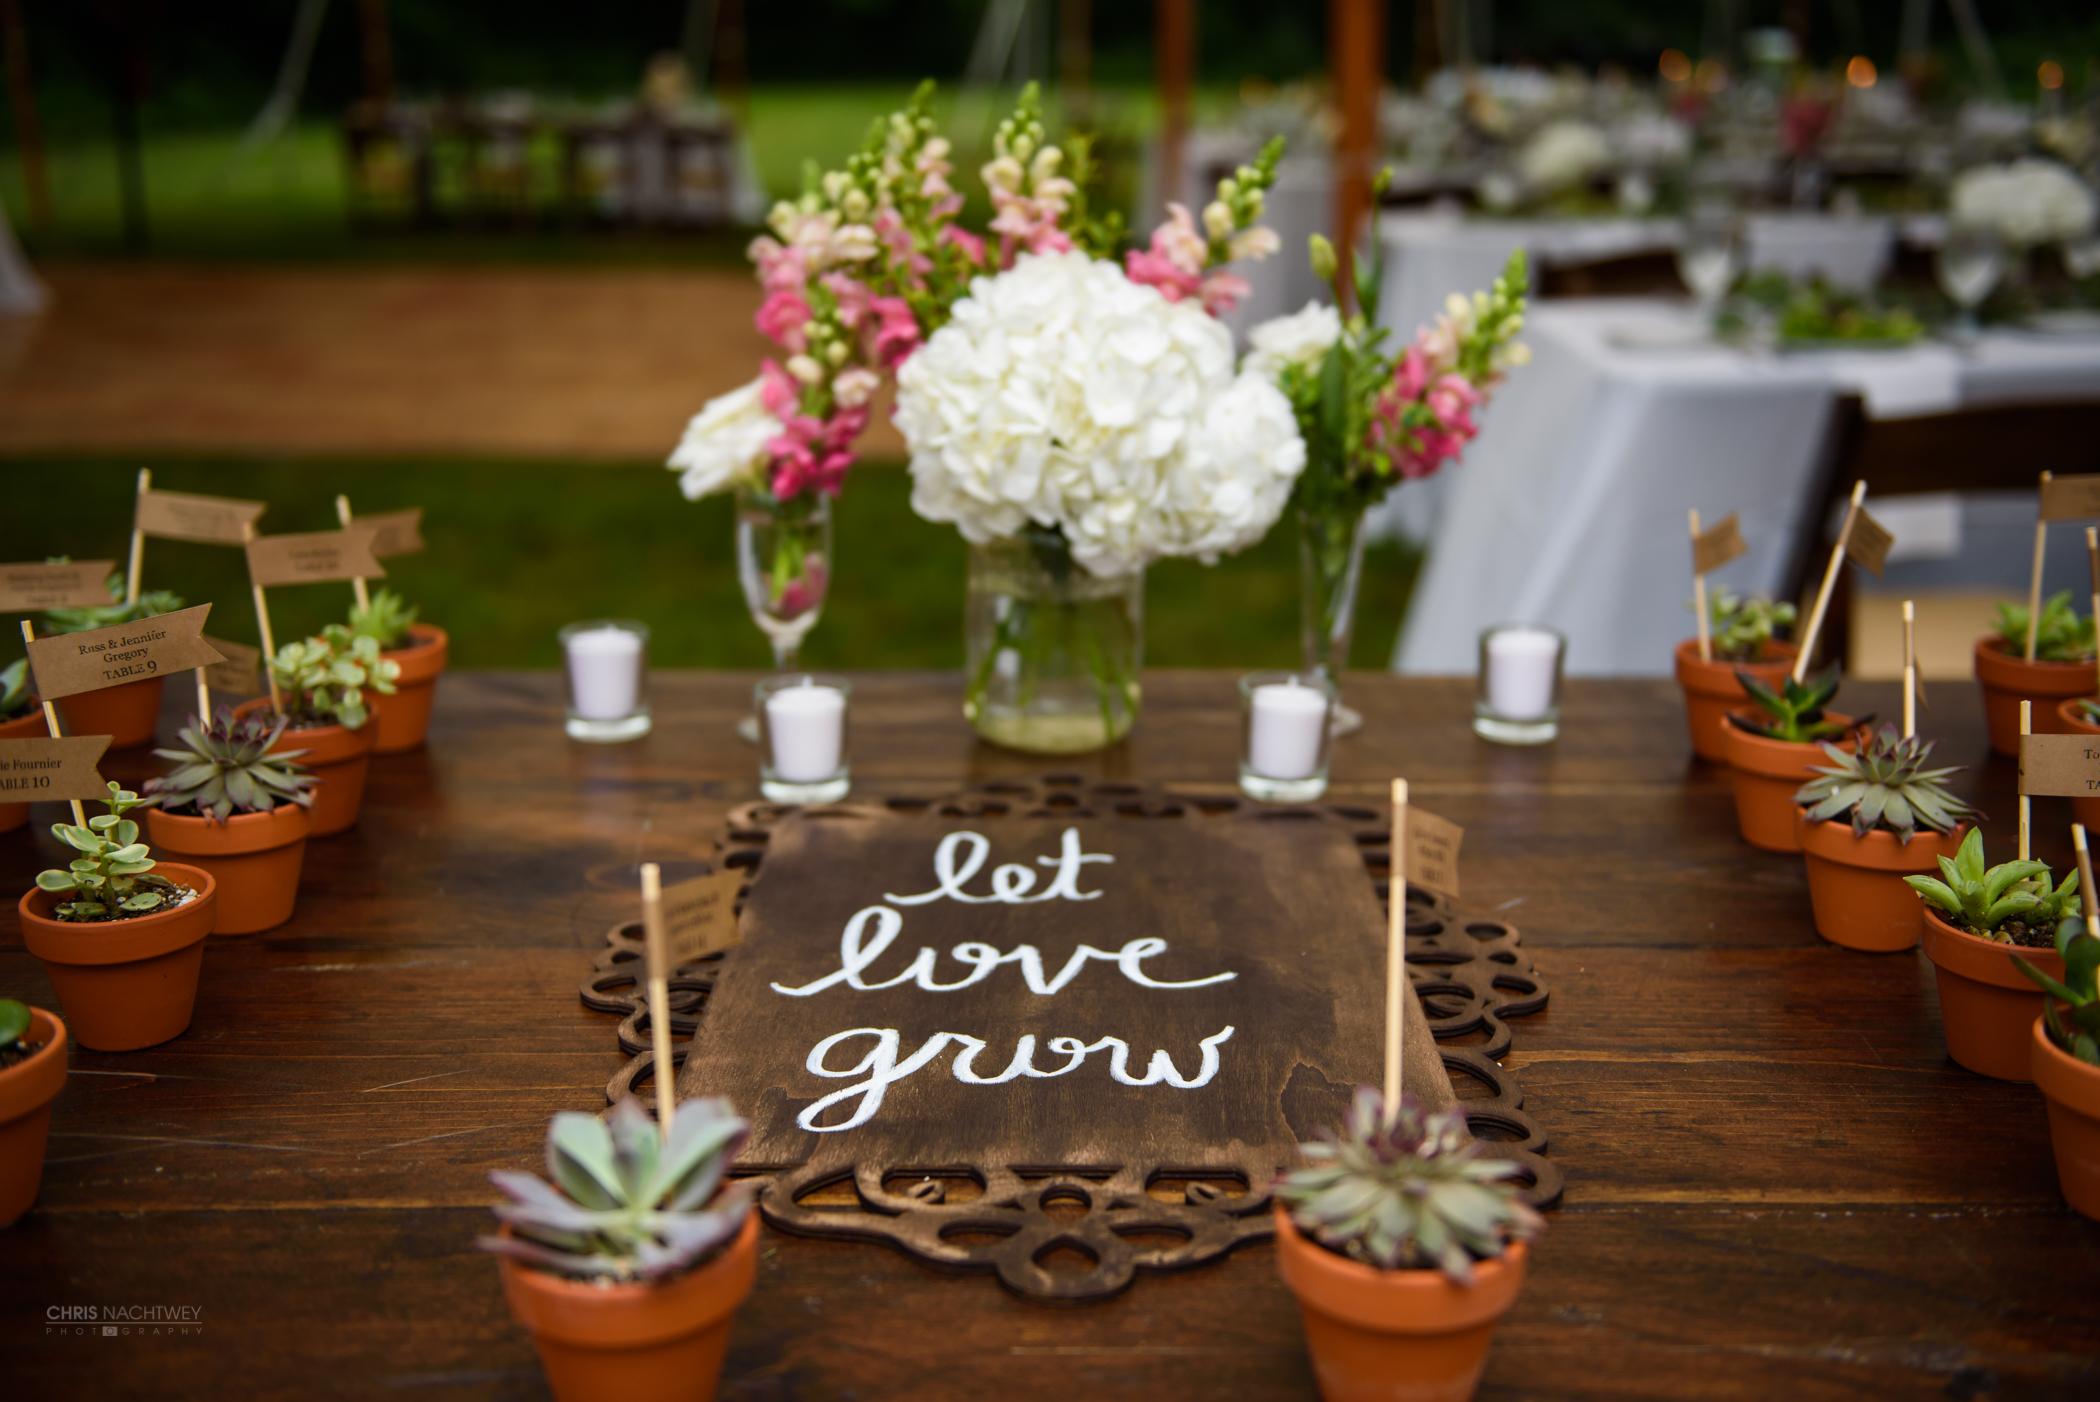 ct-wedding-photographers-chris-nachtwey.jpg